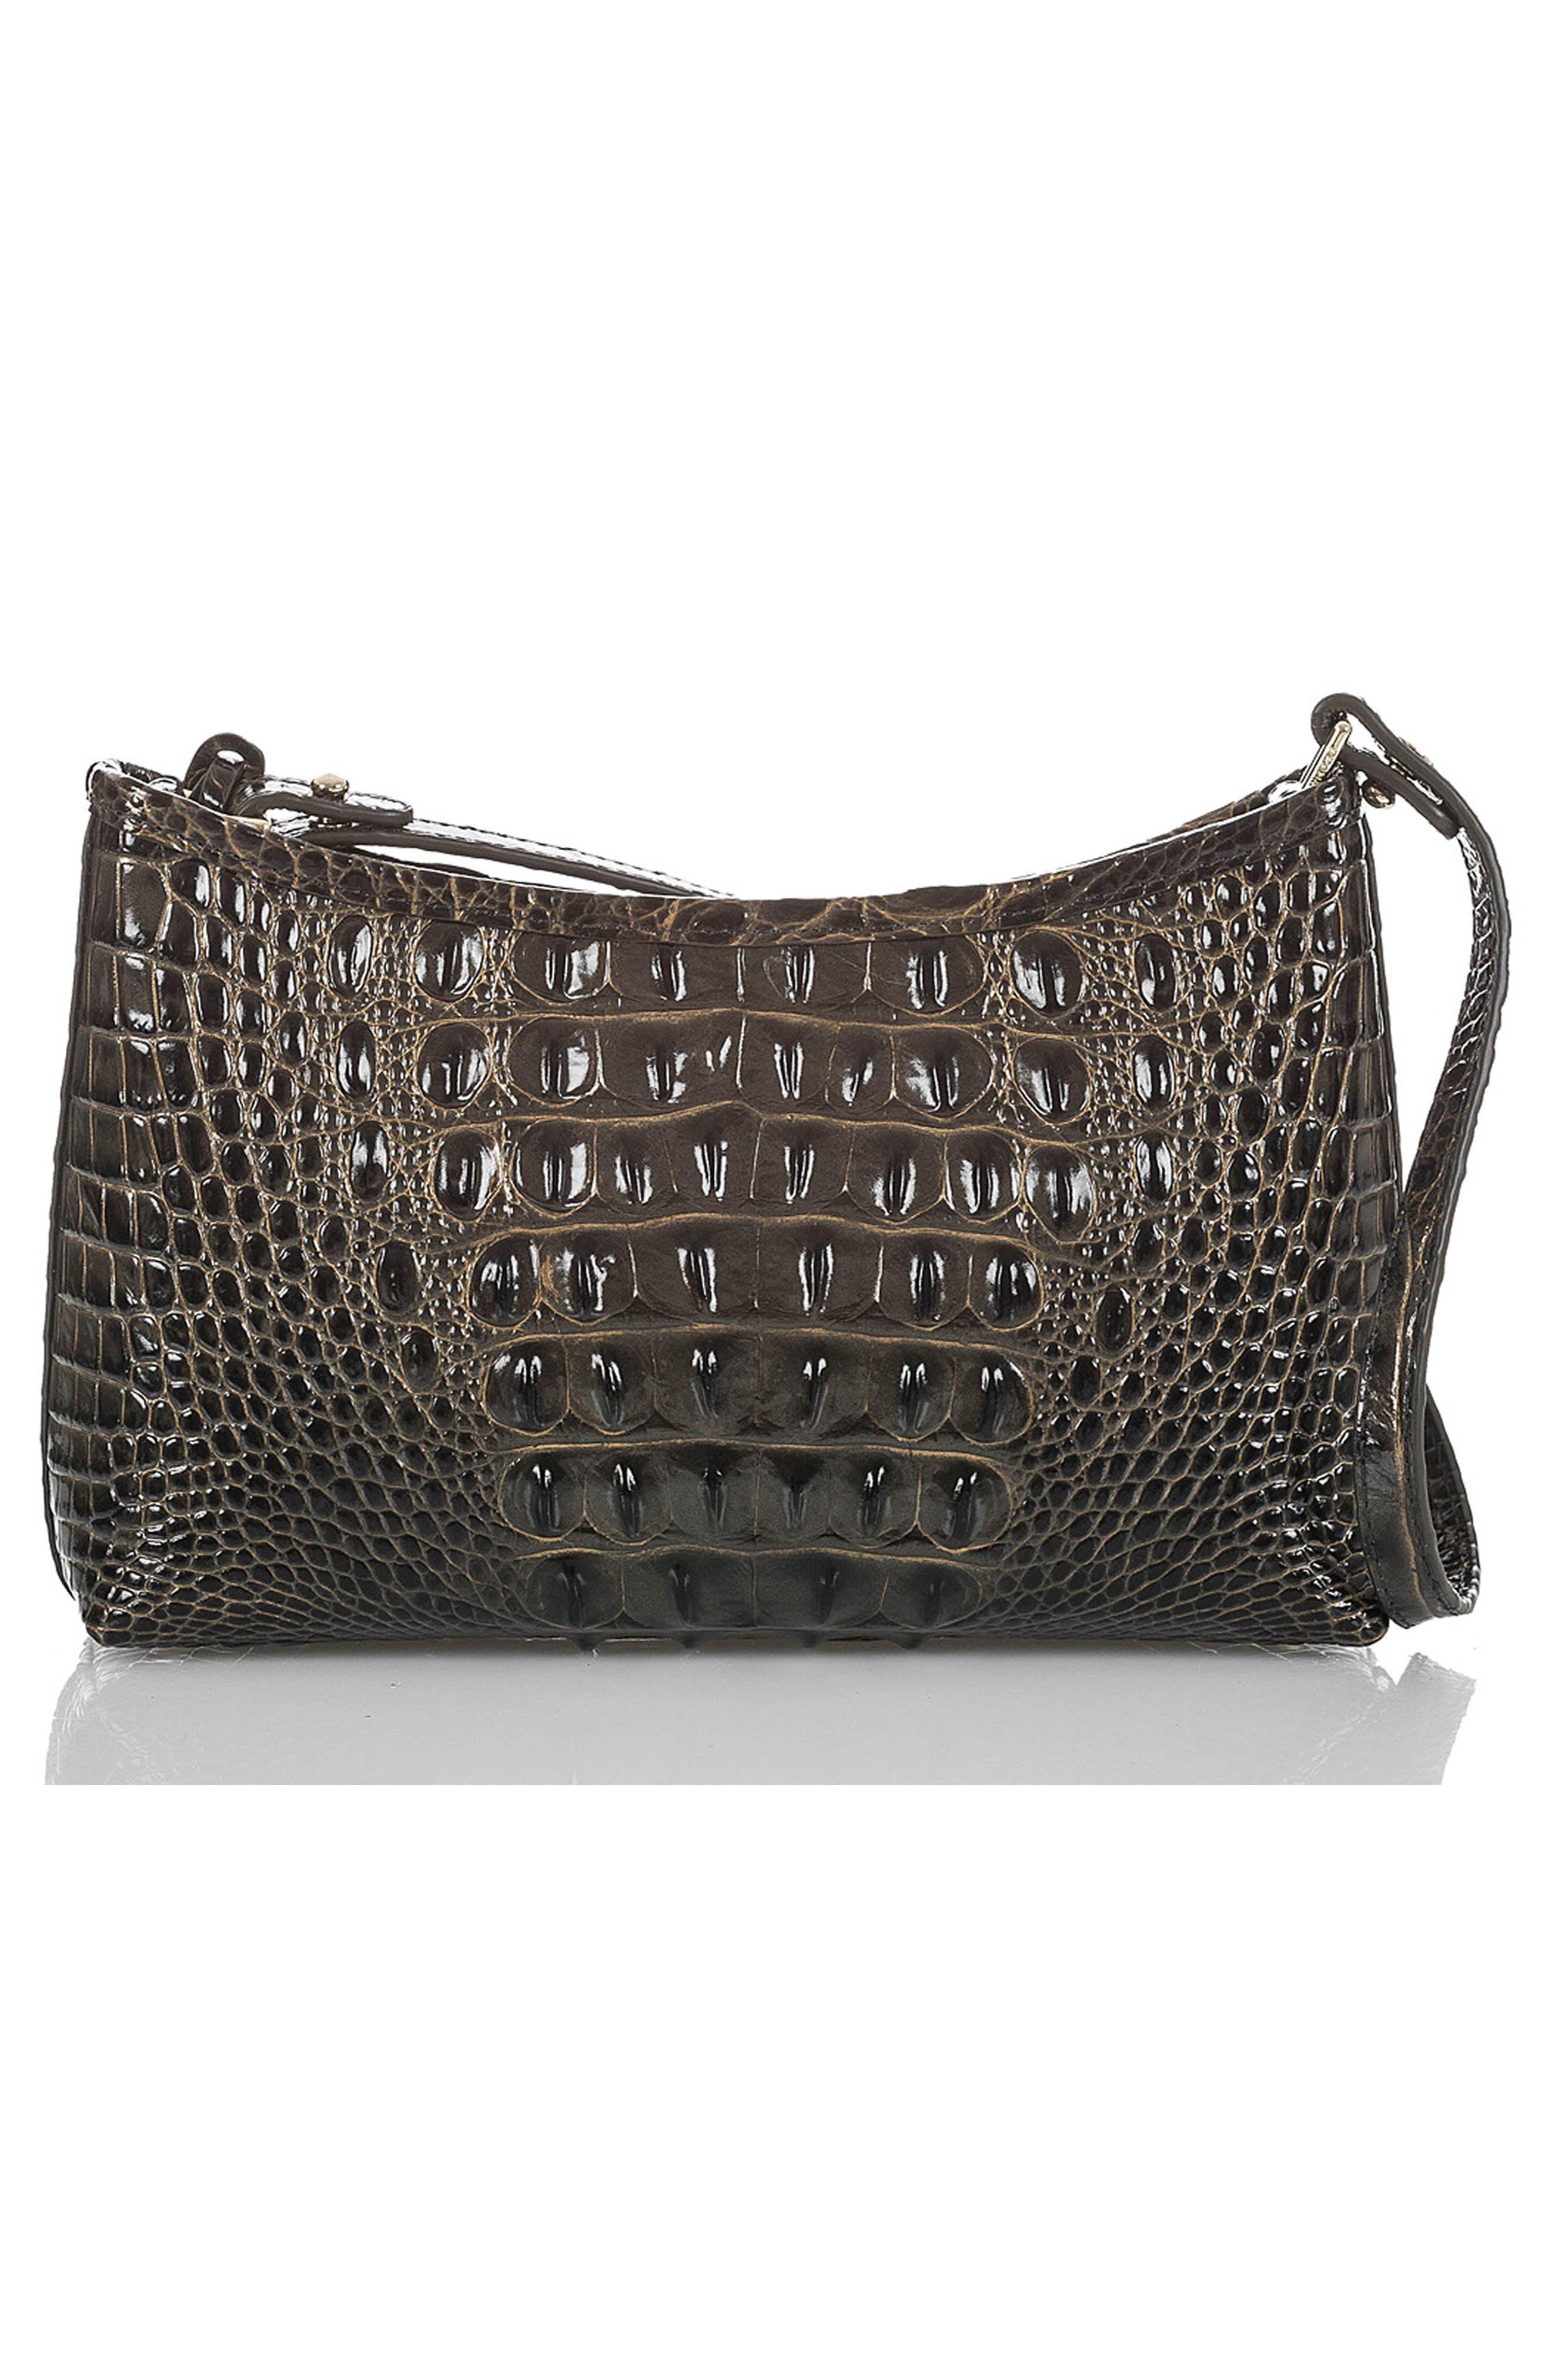 'Anytime - Mini' Convertible Handbag,                             Alternate thumbnail 2, color,                             GRAPHITE